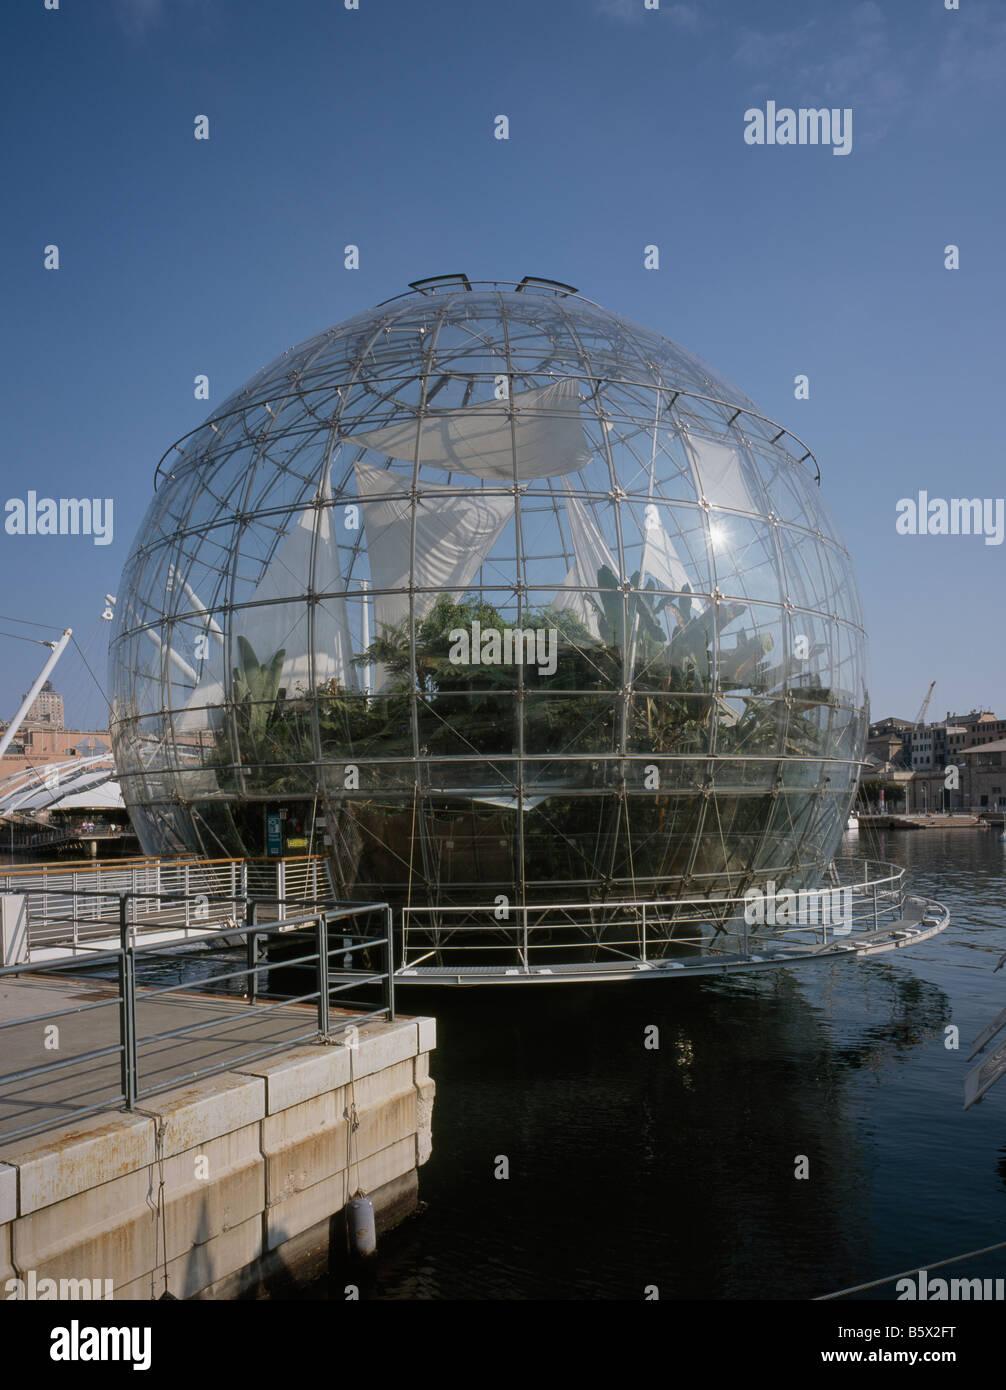 La Bolla, Genova, By Renzo Piano - Stock Image